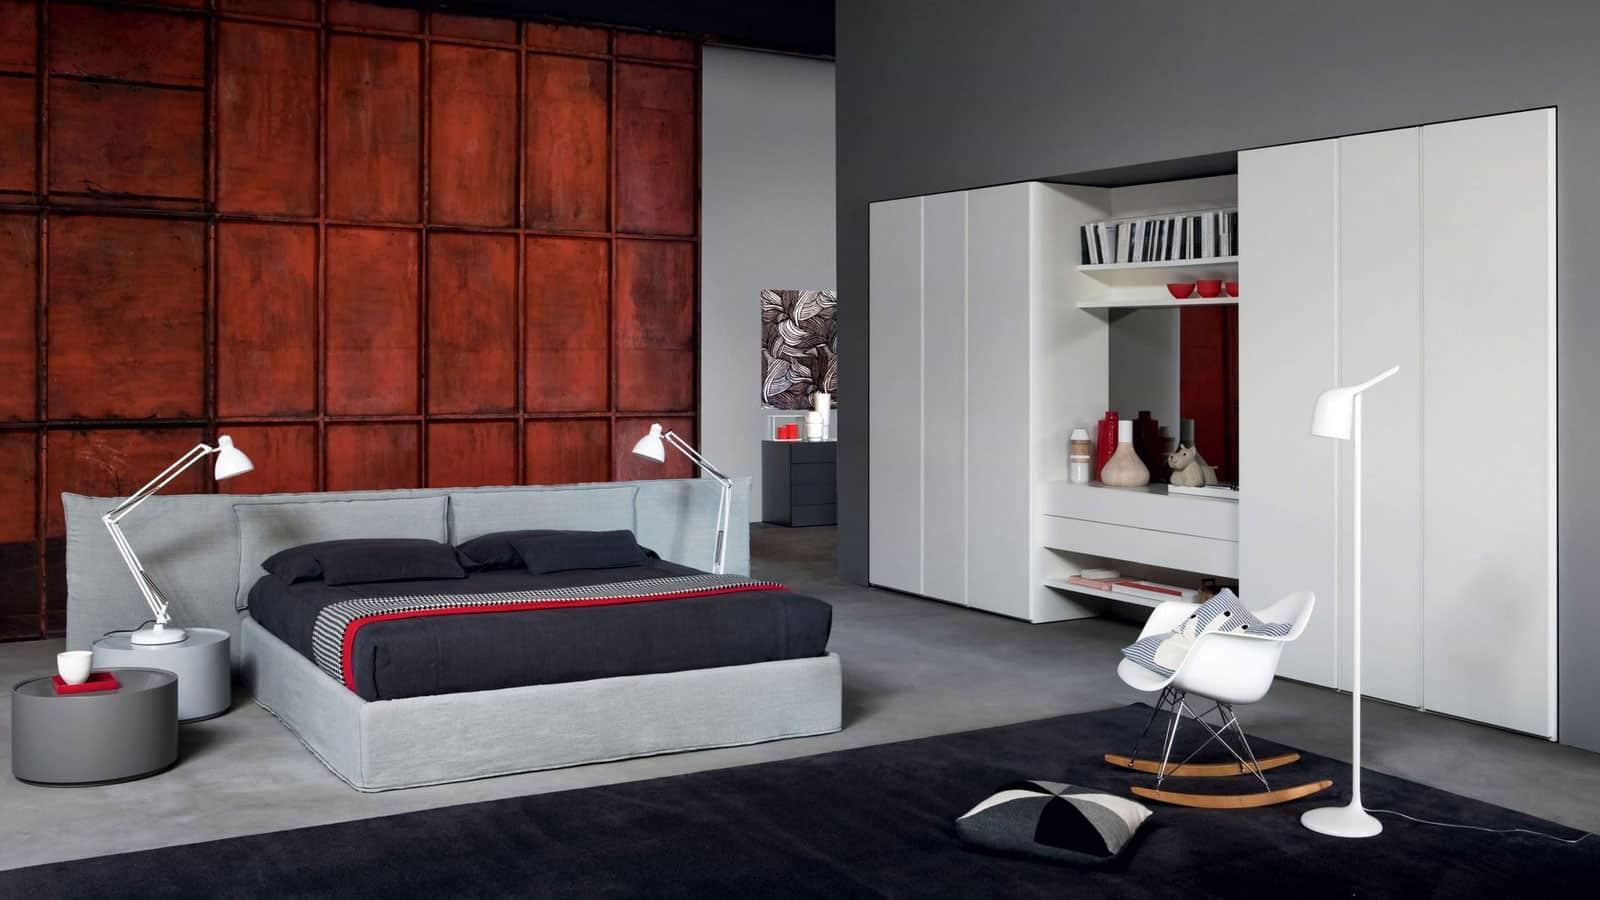 Meubles De Chambre A Coucher Annecy Optimal Agencement